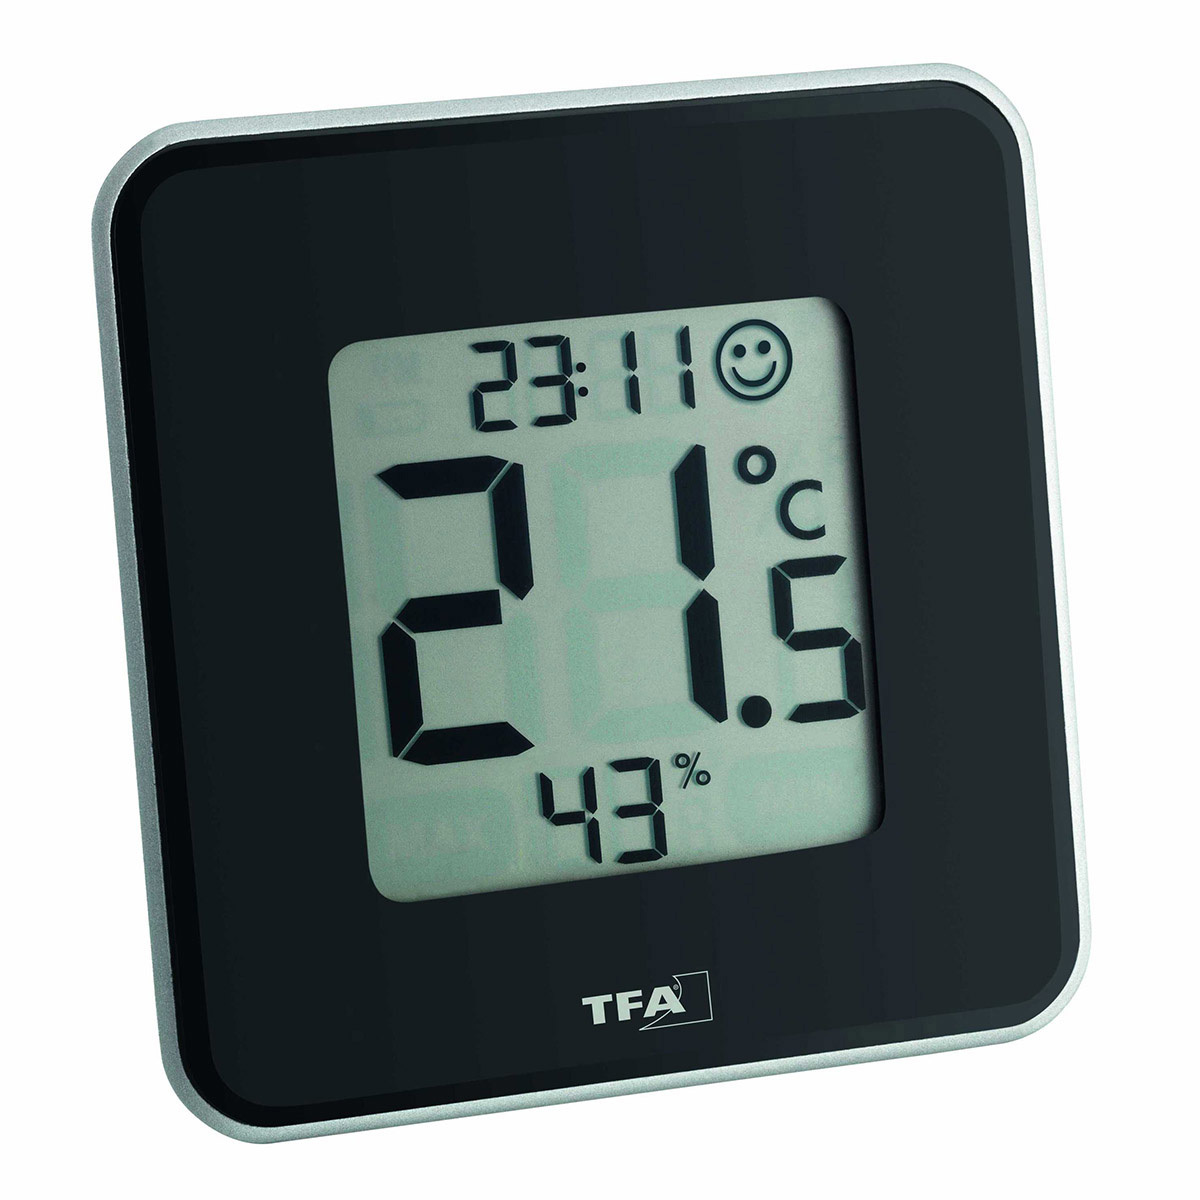 30-5021-01-digitales-thermo-hygrometer-style-ansicht-1200x1200px.jpg